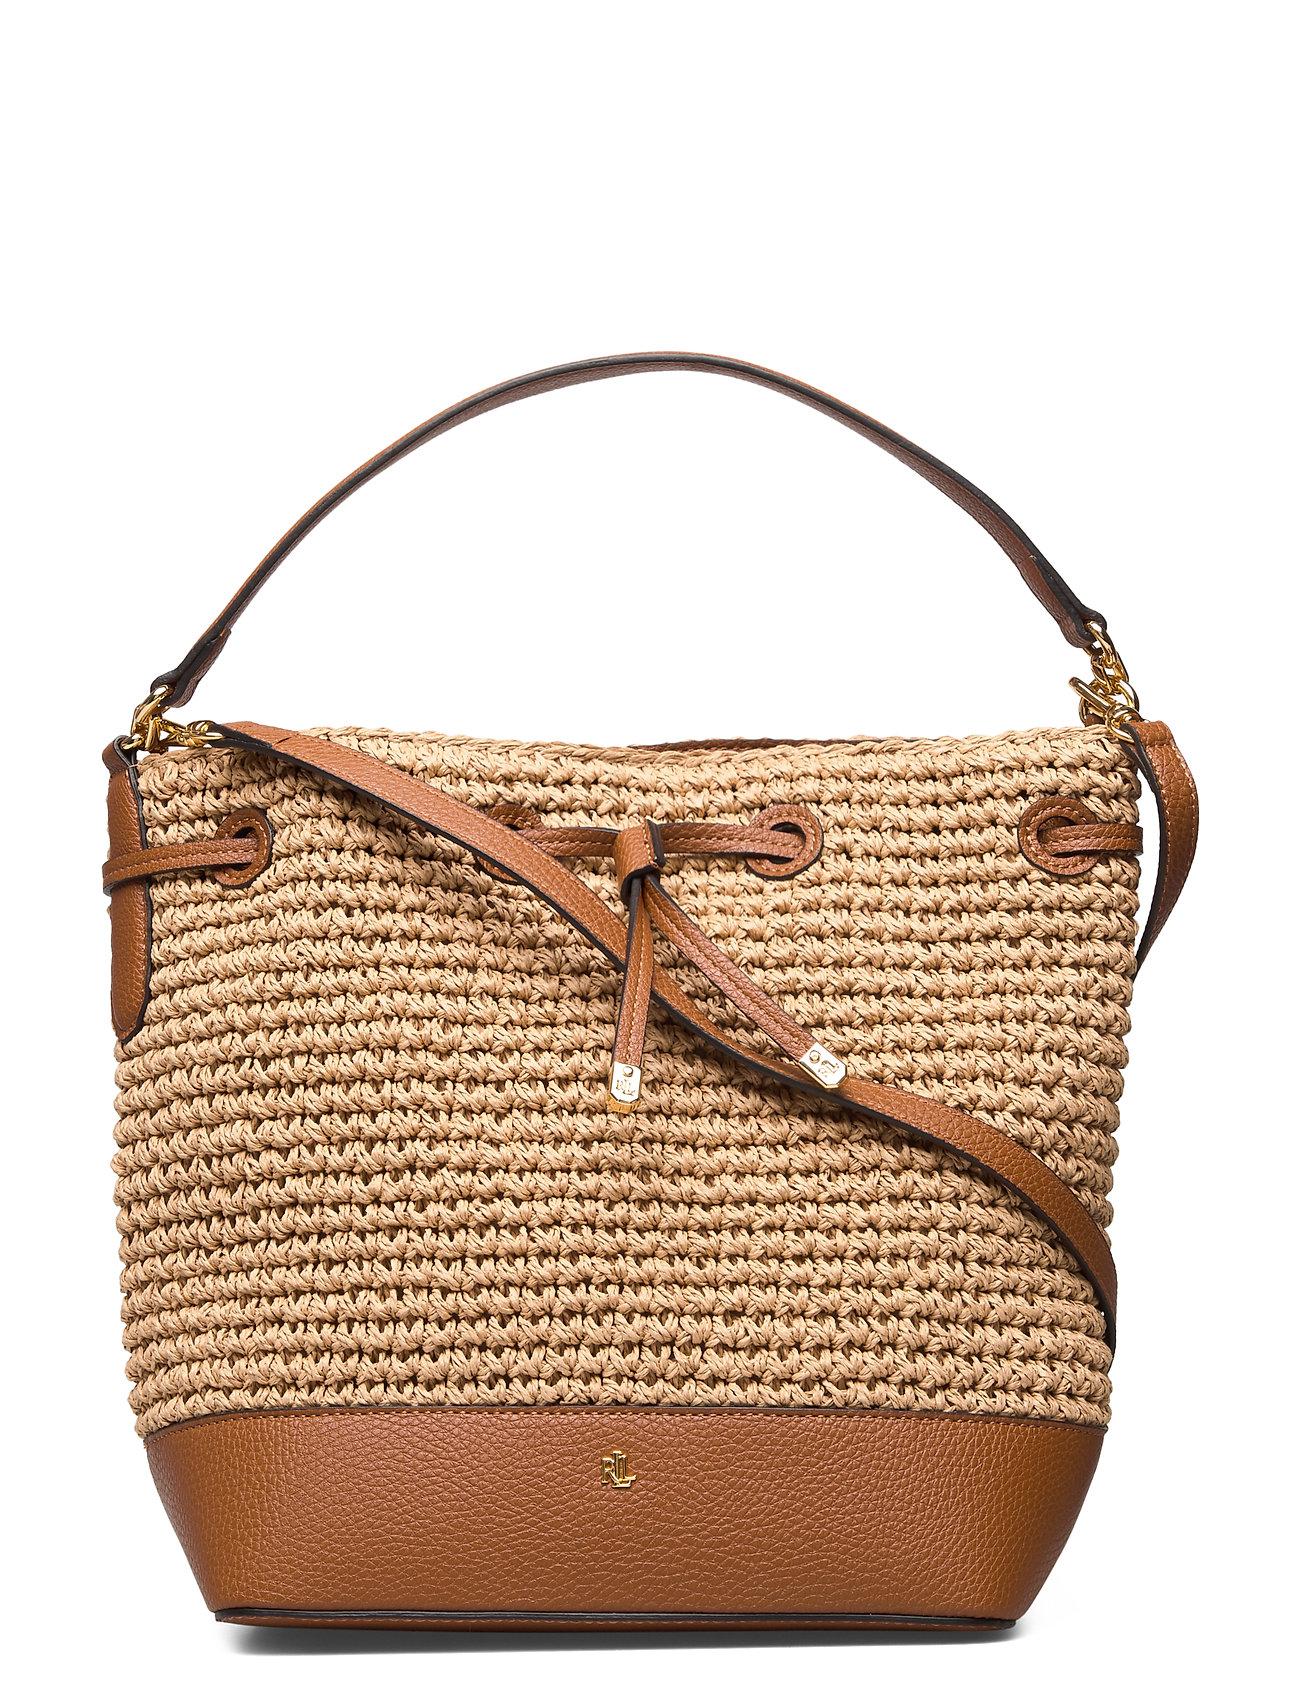 Lauren Ralph Lauren Straw Debby Drawstring Bag - NATURAL